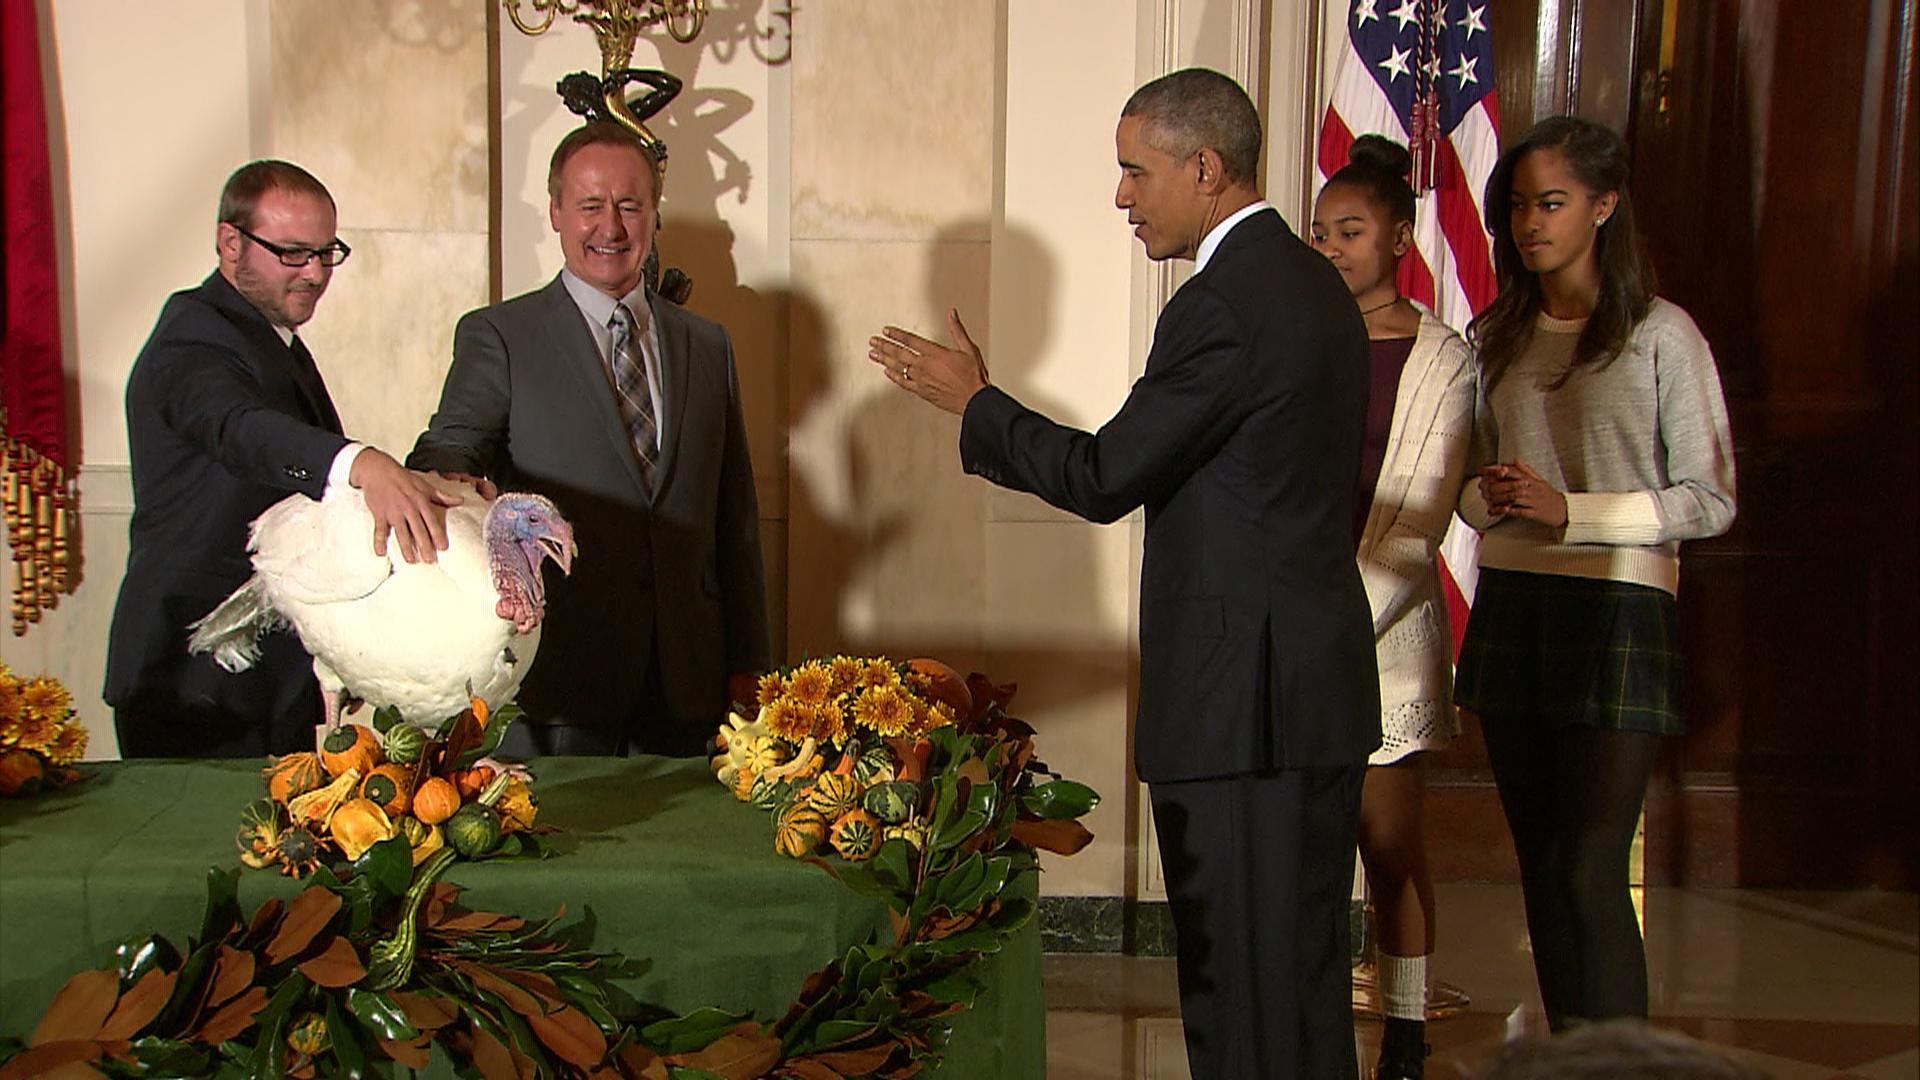 Pres. Obama pardons the National Turkey